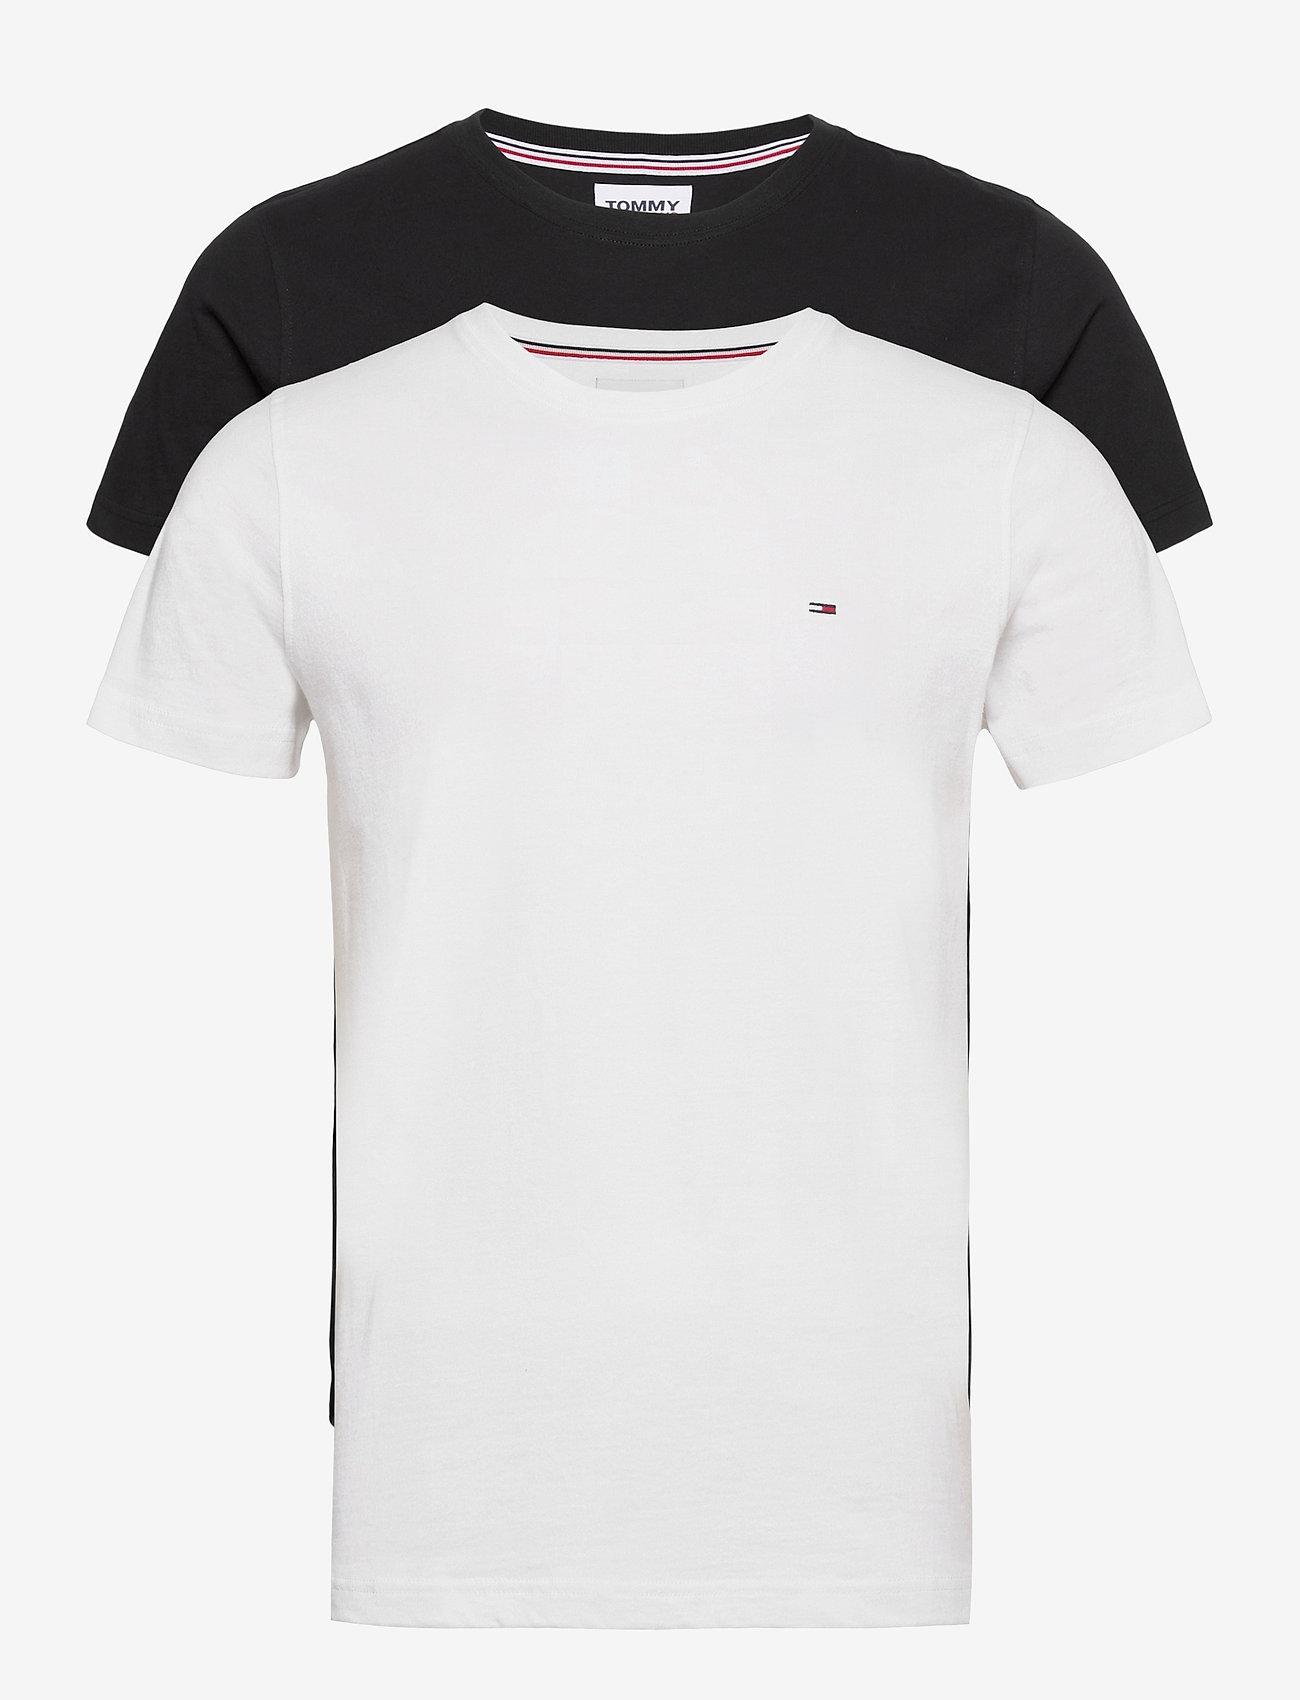 Tommy Jeans - TJM 2PACK CNECK TEES - basic t-shirts - white / black - 0